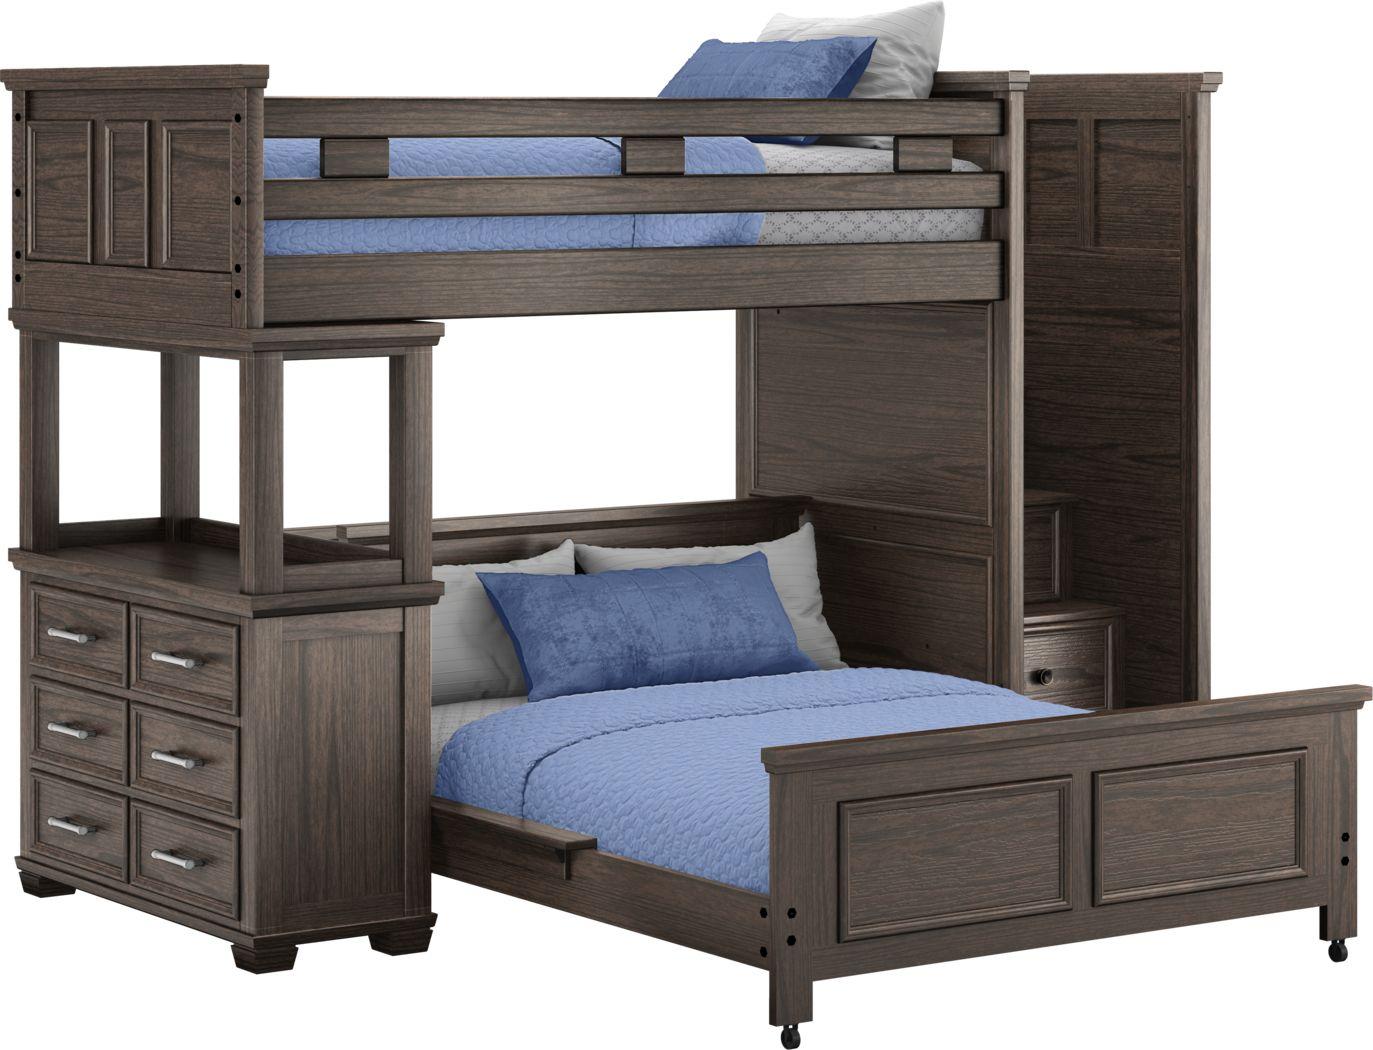 Canyon Lake Java Twin/Full Step Loft with Dresser